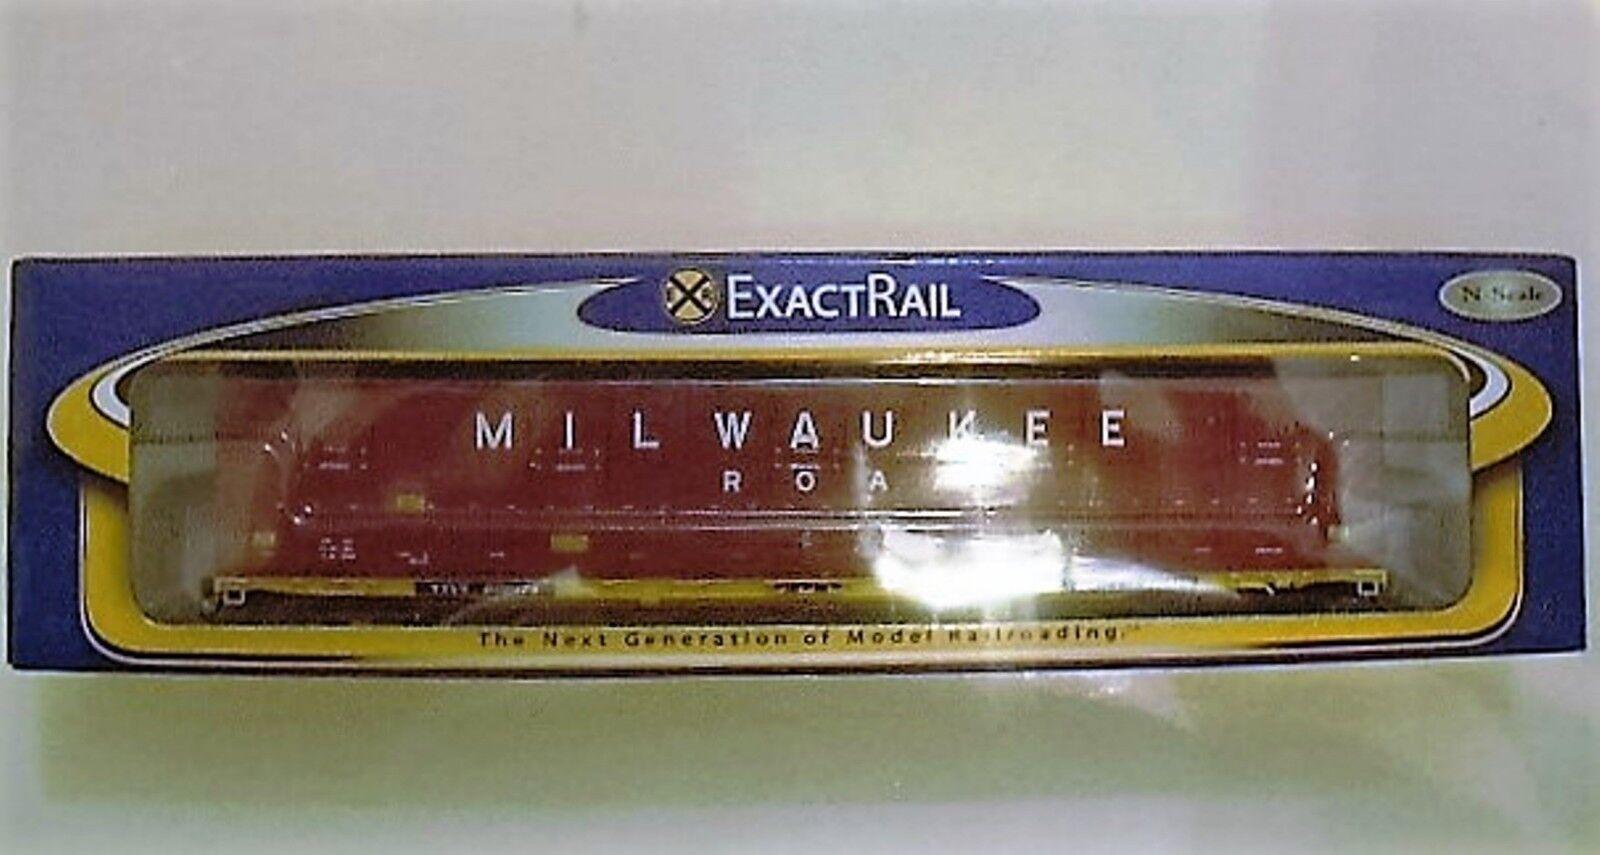 2011 EXACTRAIL EN-50502-3 – N SCALE – green-A-PAC – MILWAUKEE ROAD TTVX 802174